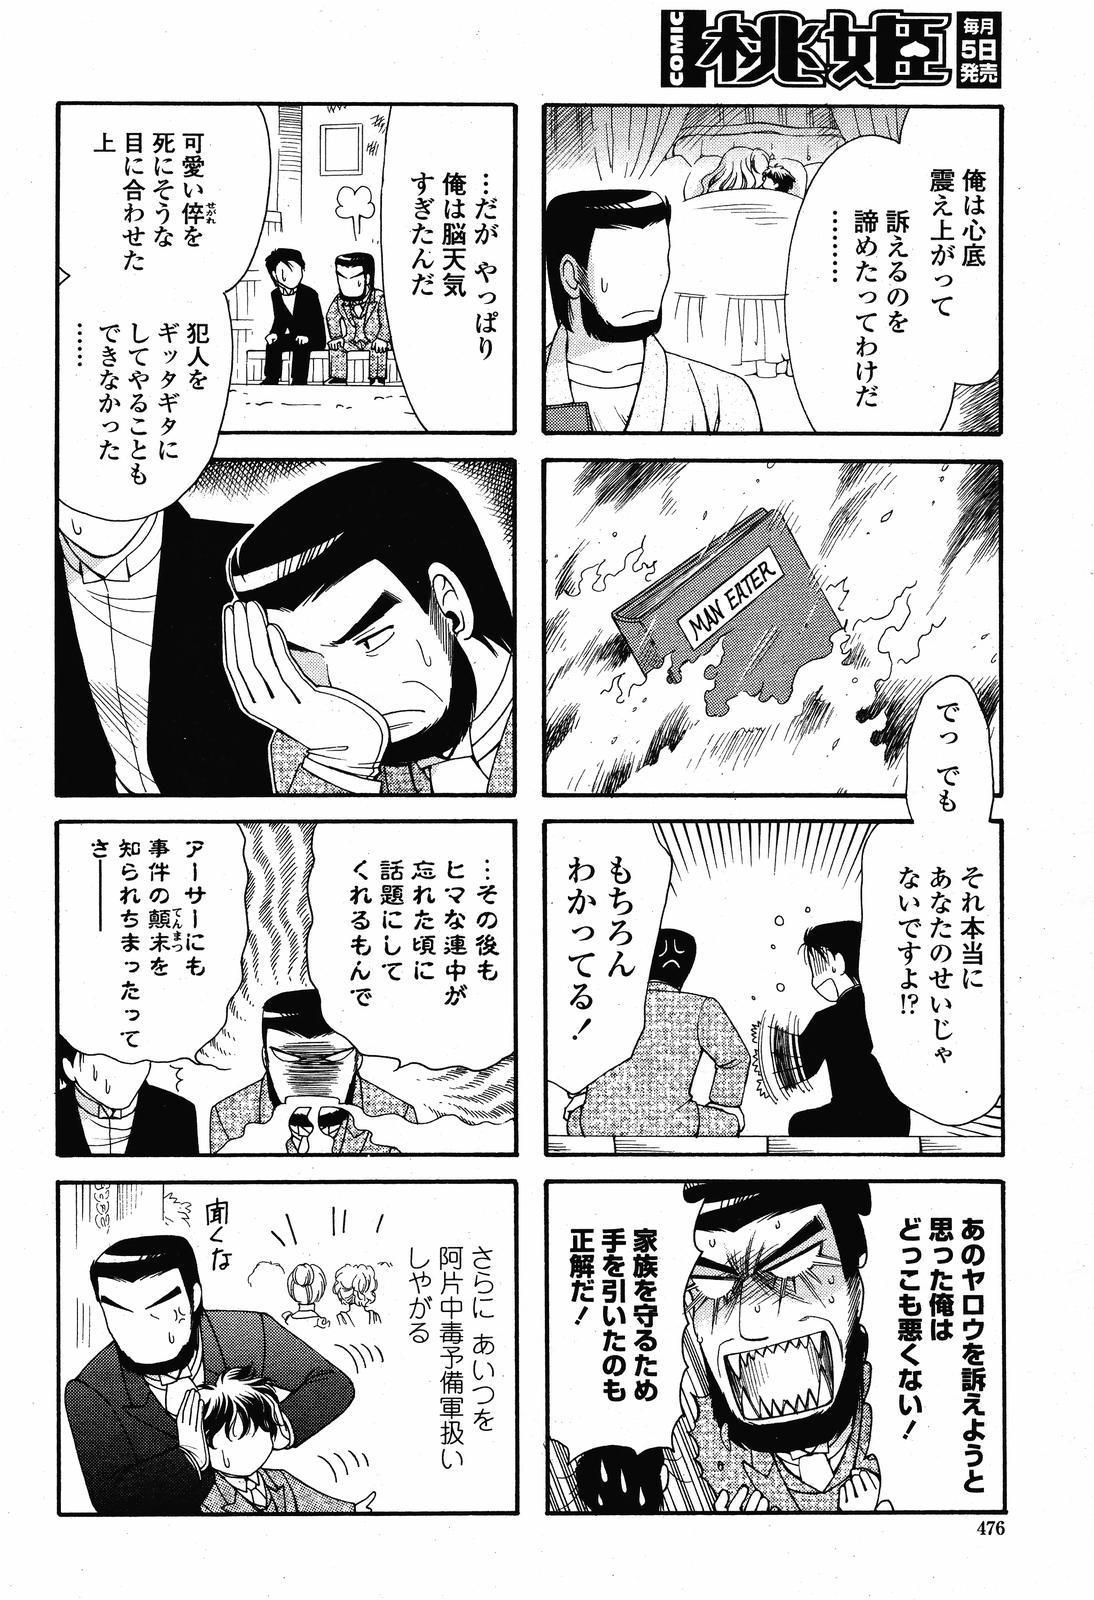 COMIC Momohime 2008-11 477